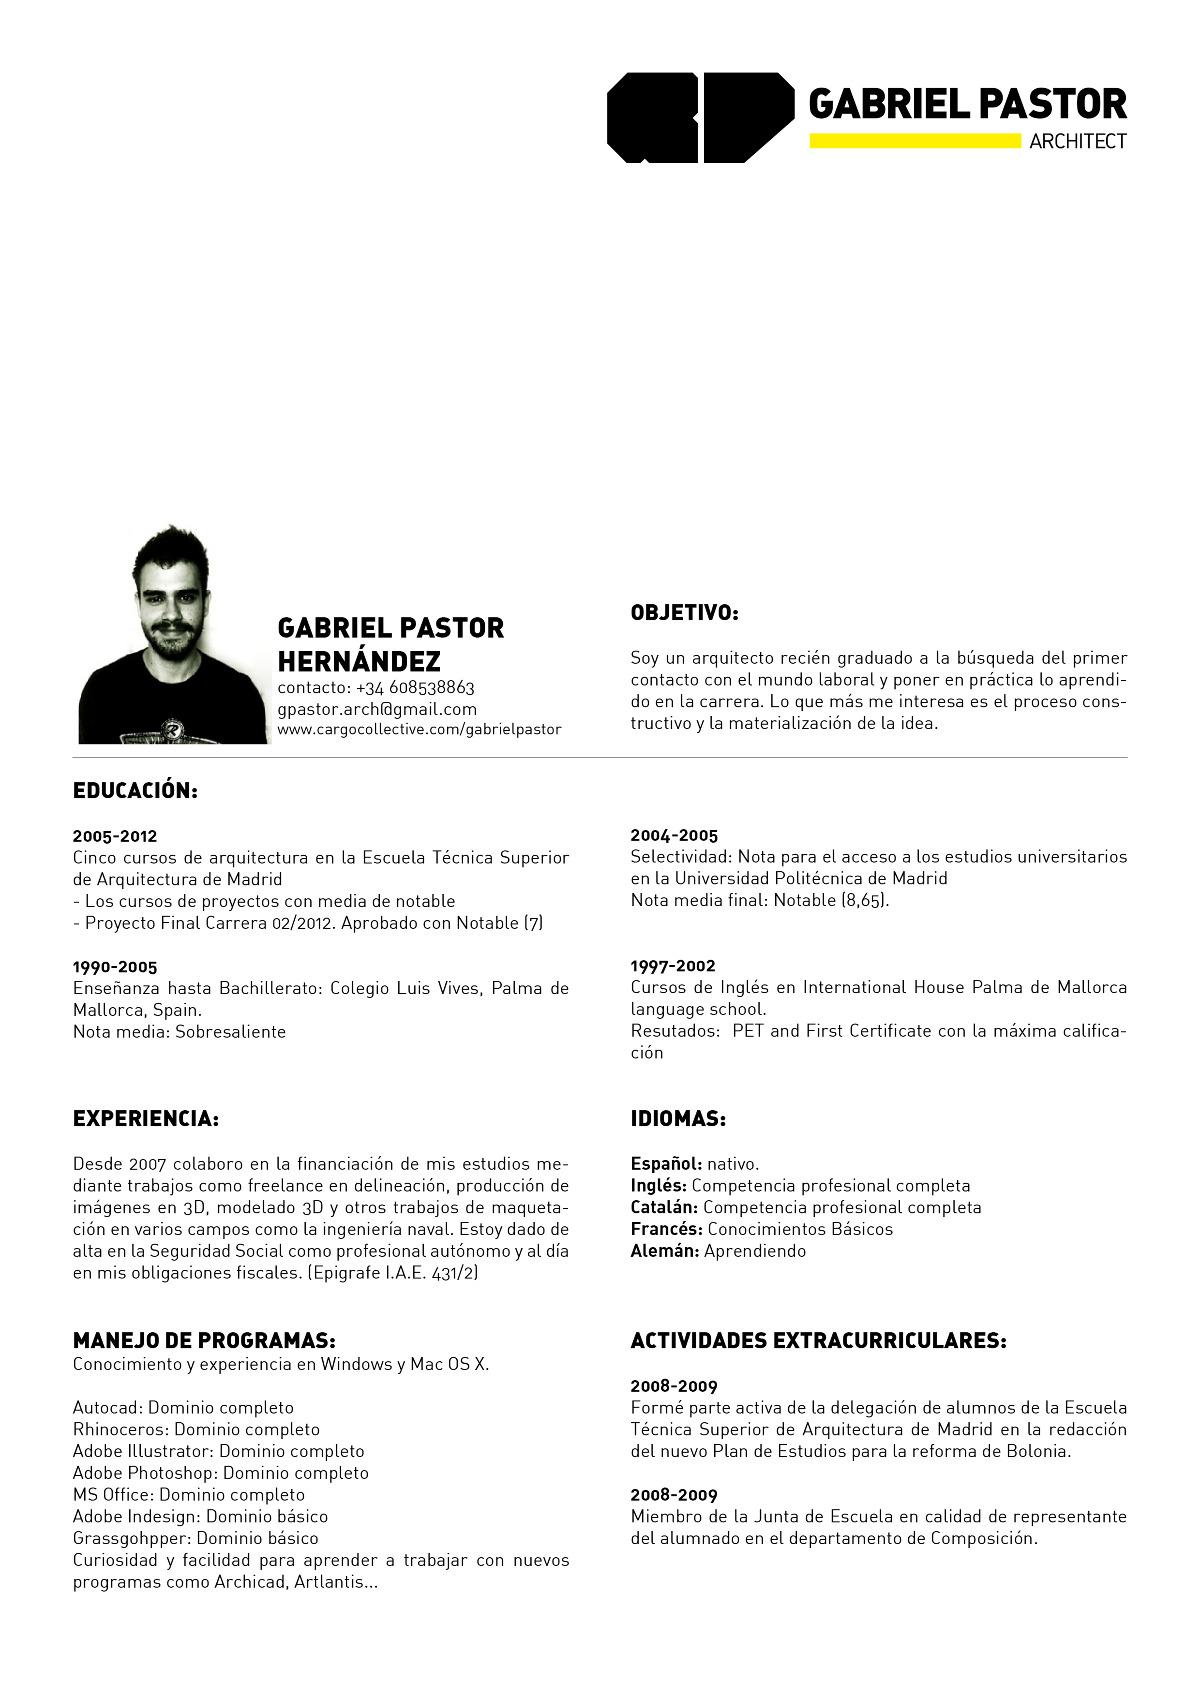 Curriculum Vitae (Esp//Eng) - gabrielpastorarch